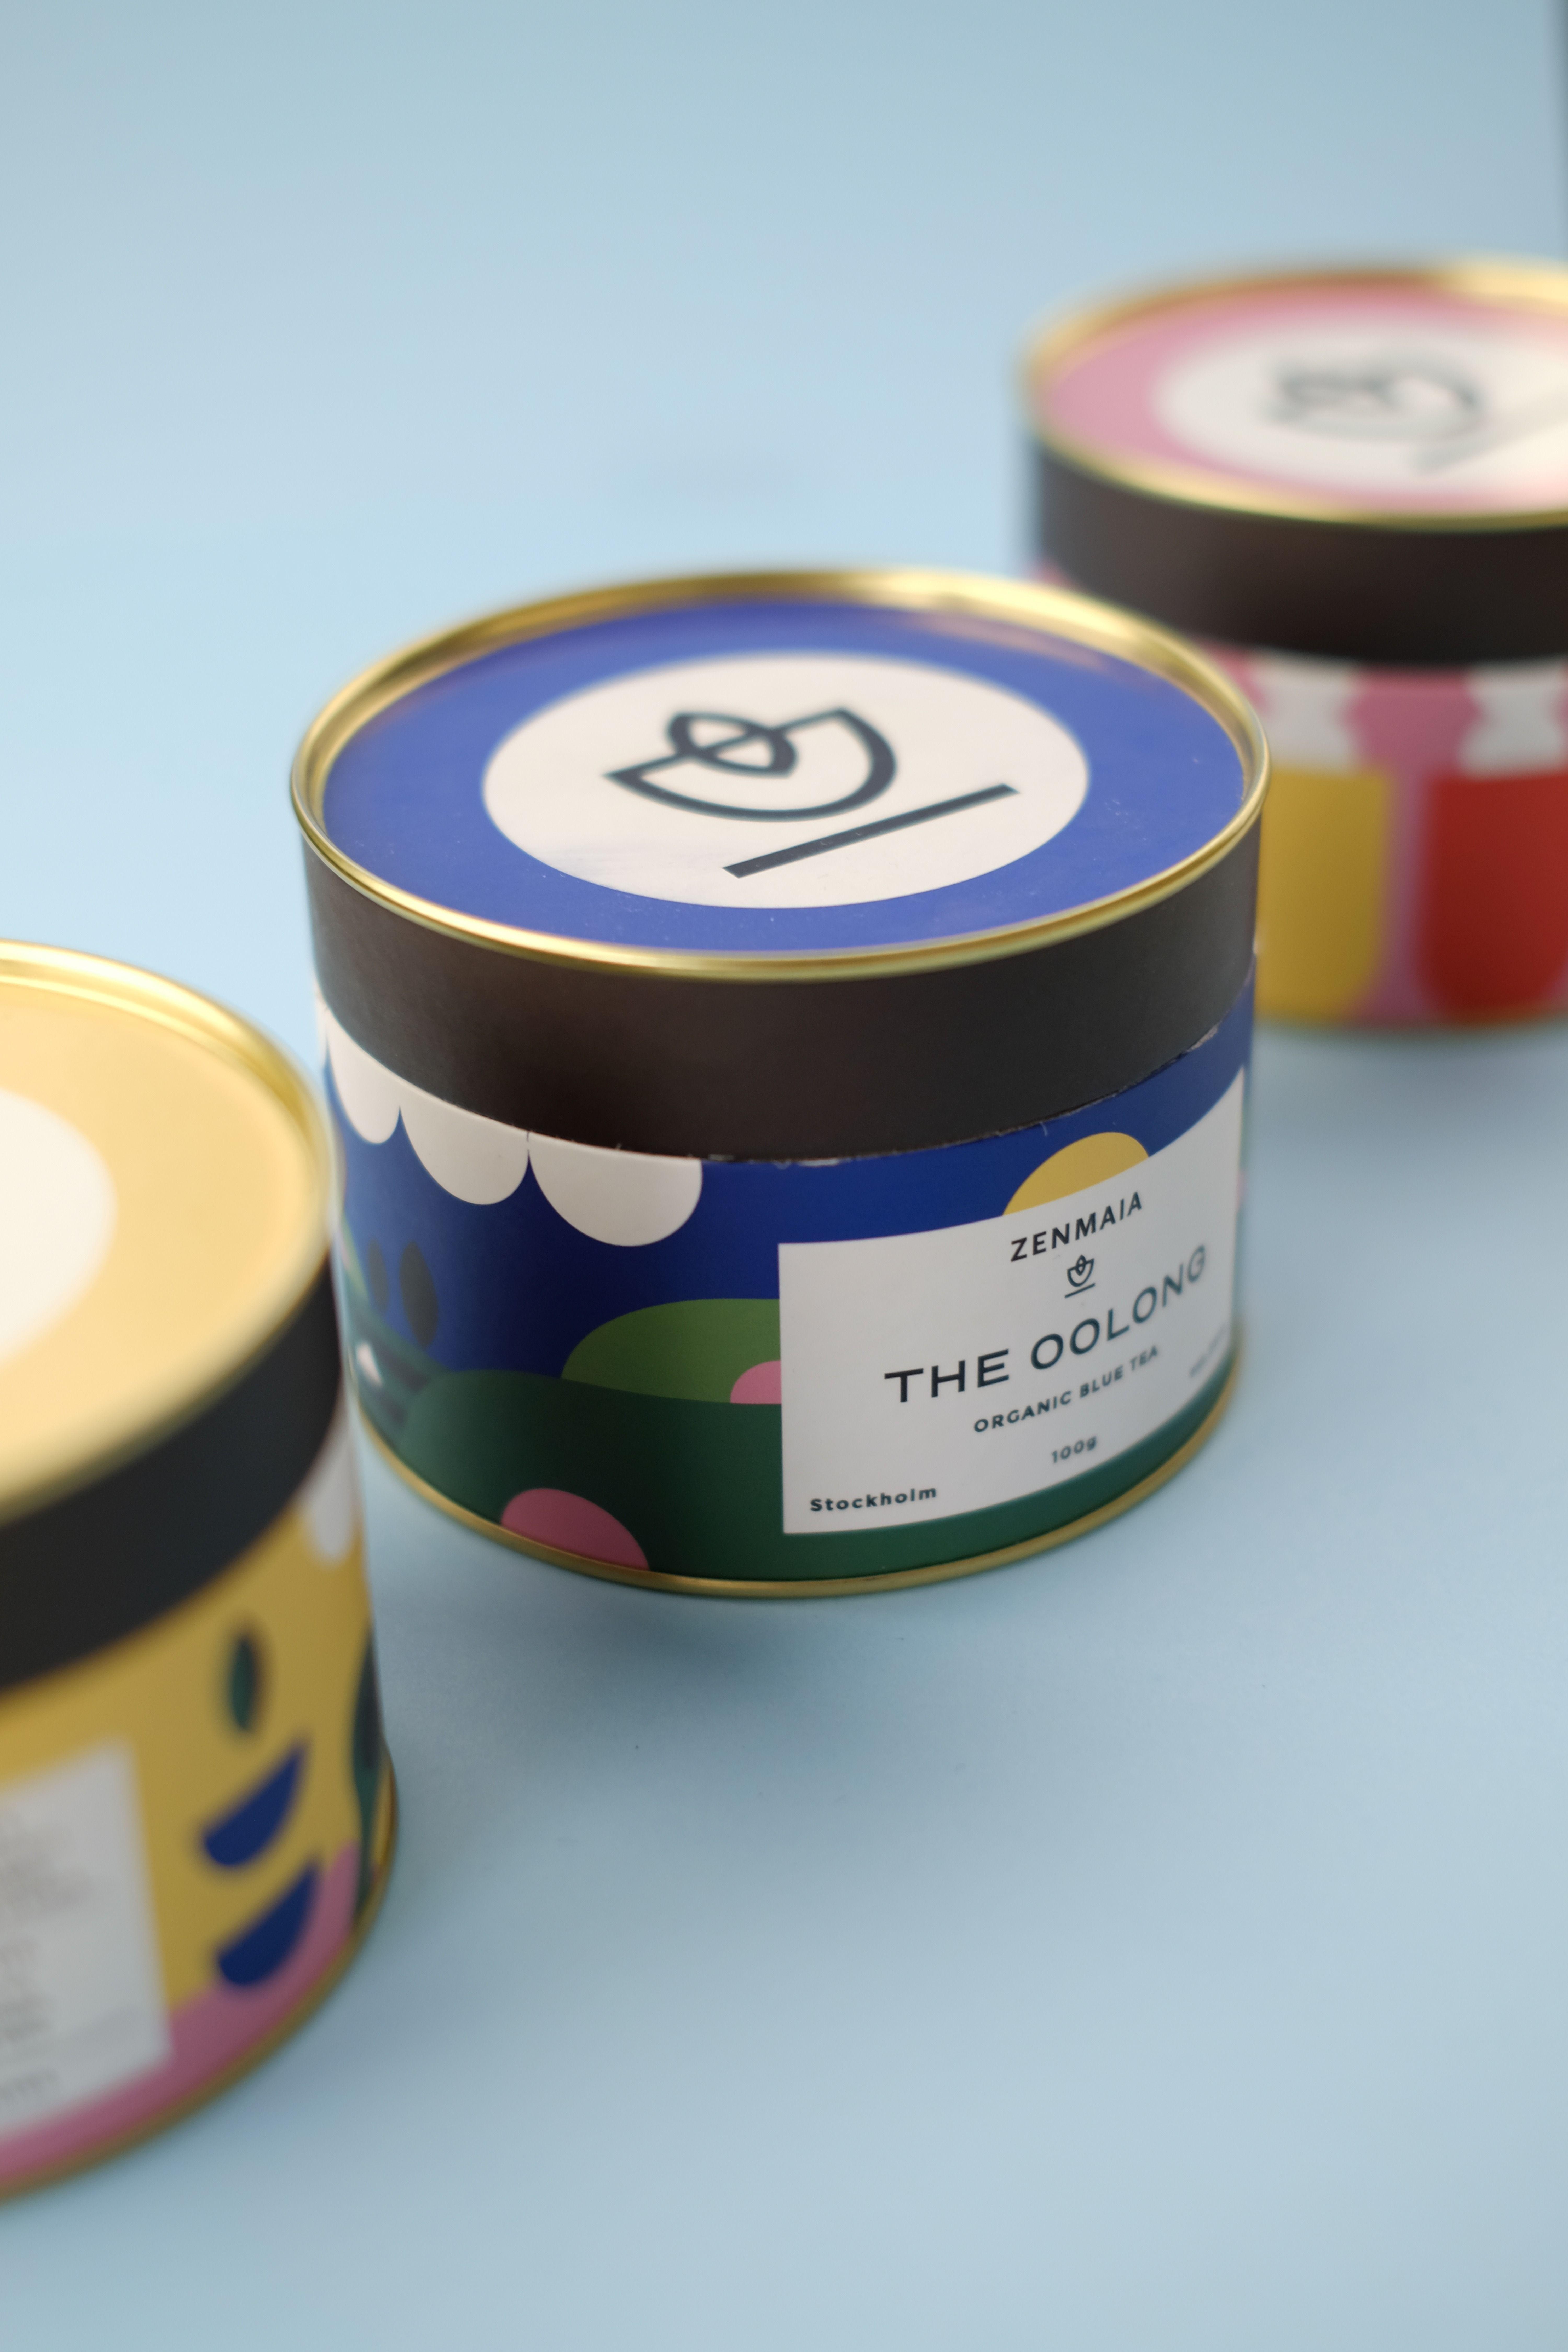 Zenmaia Tea Packaging Oolong